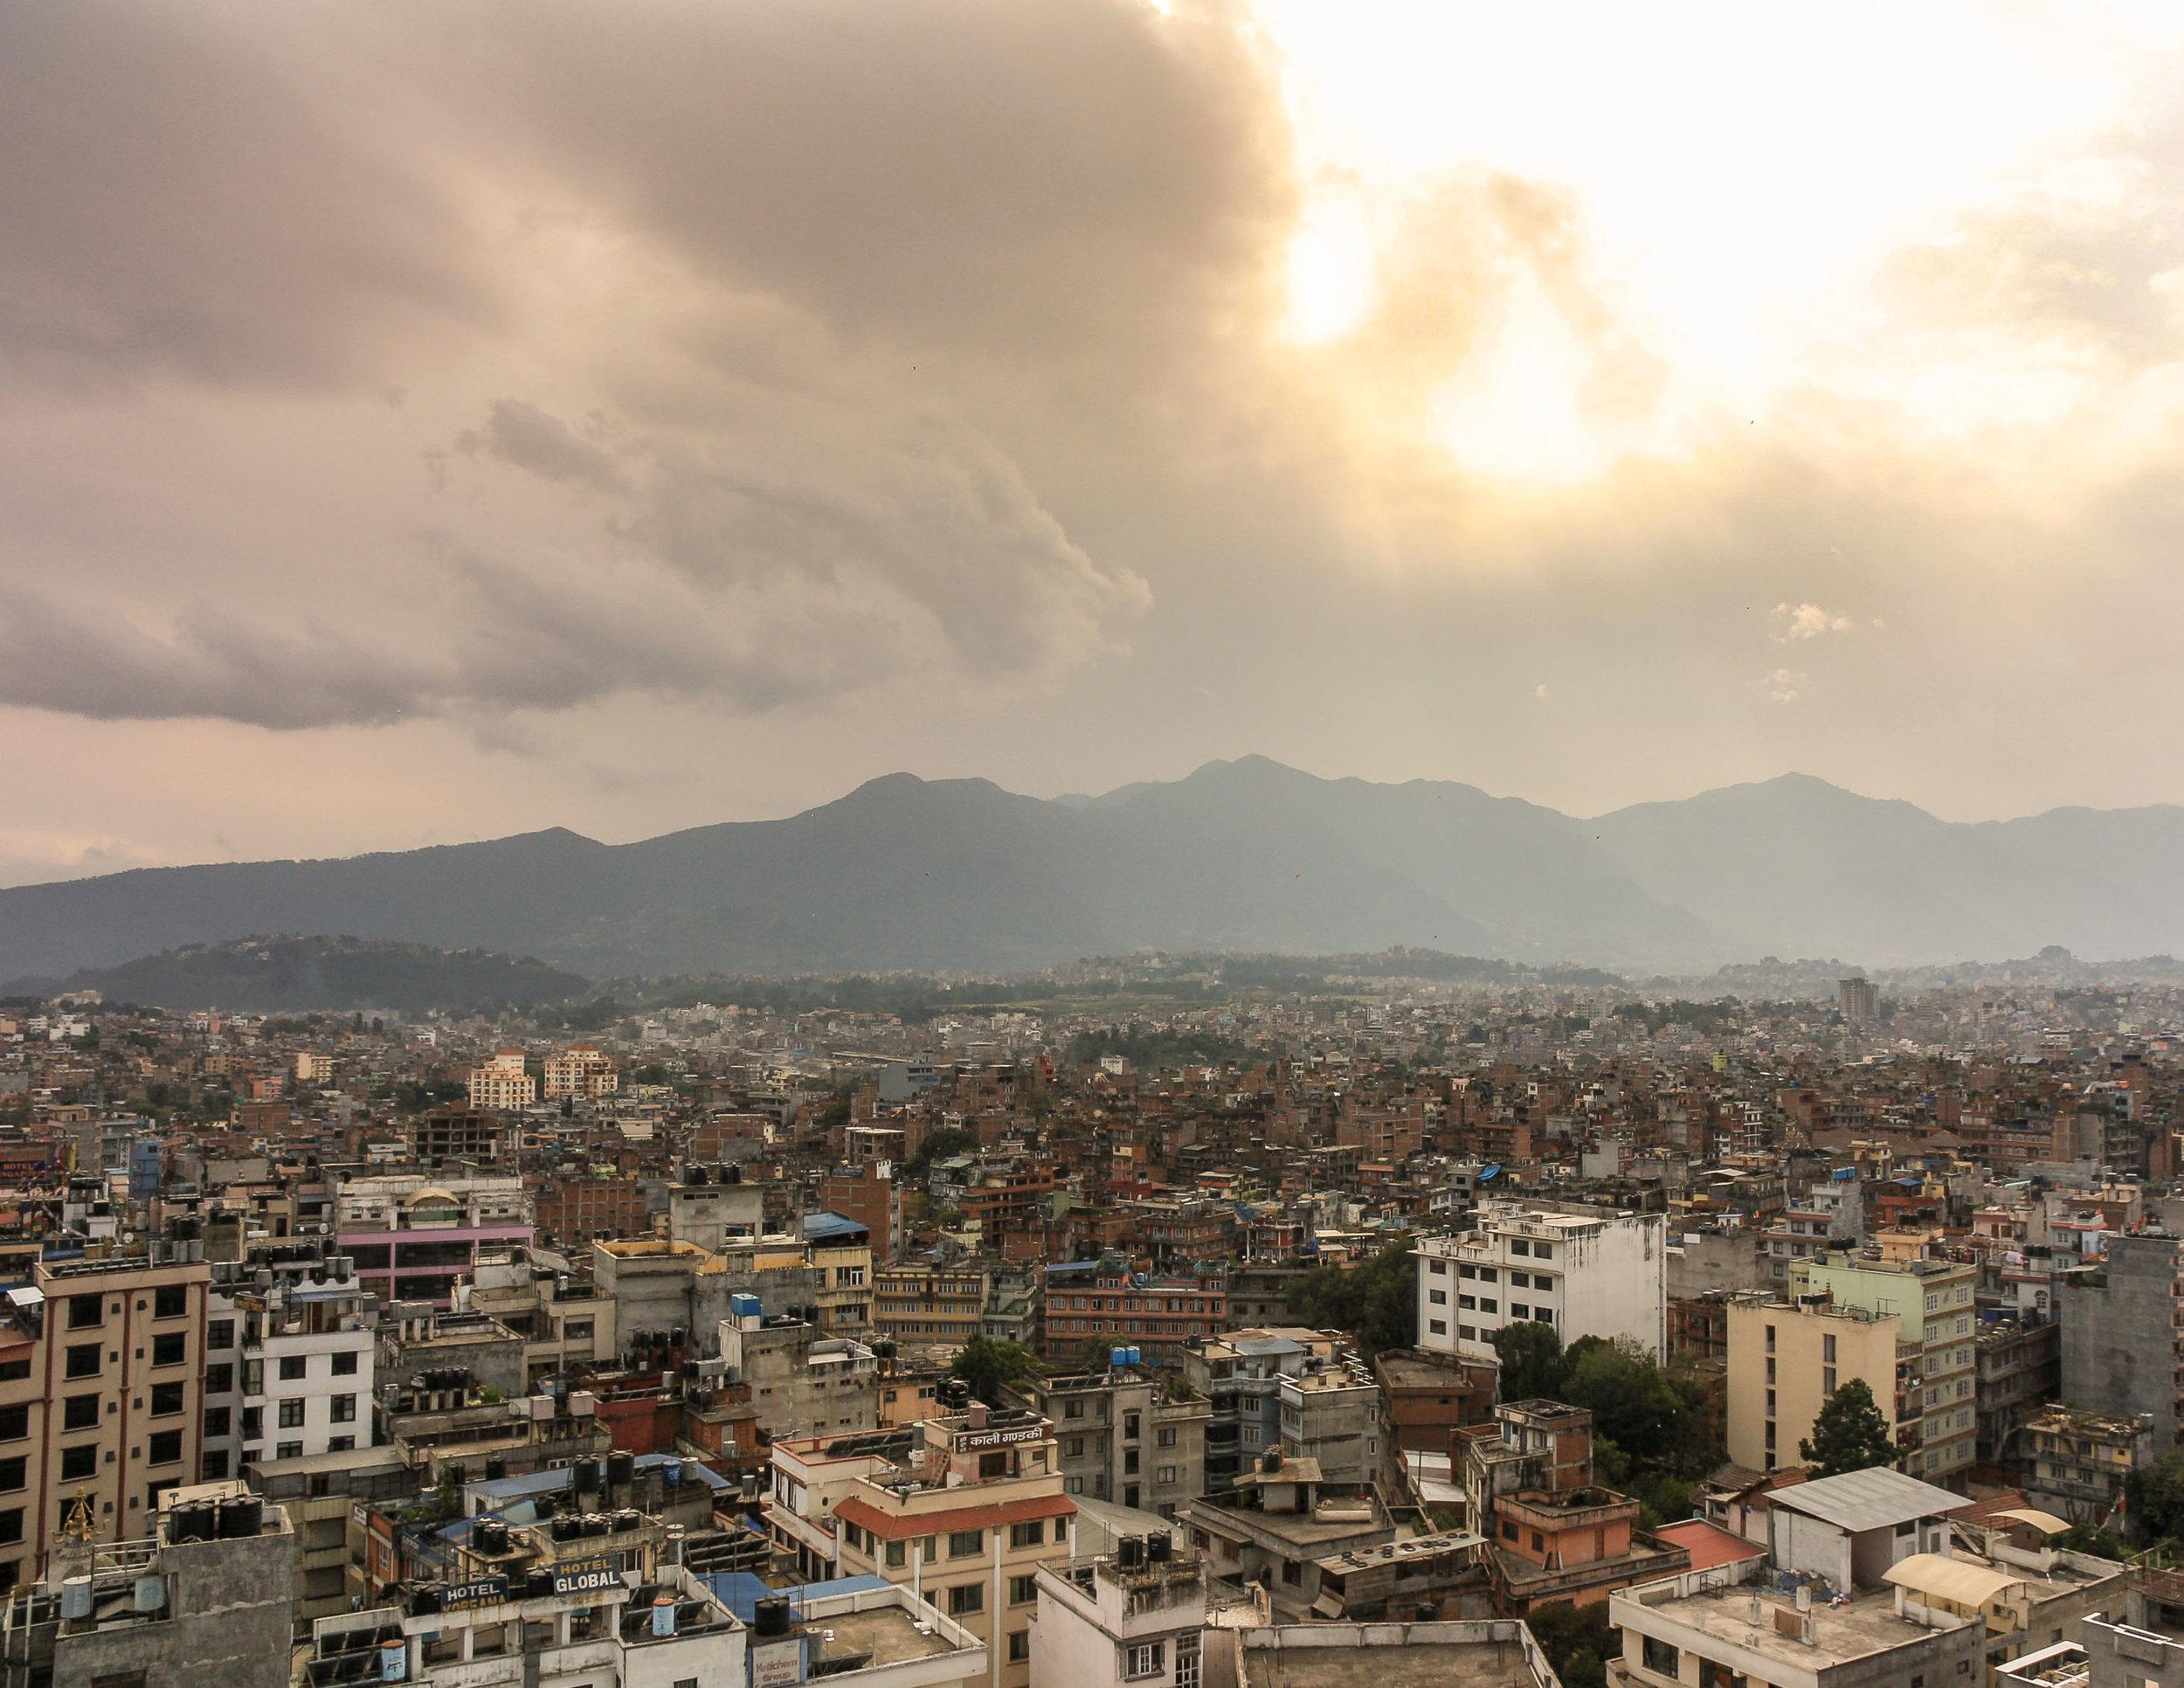 Epic skies over Kathmandu, Nepal